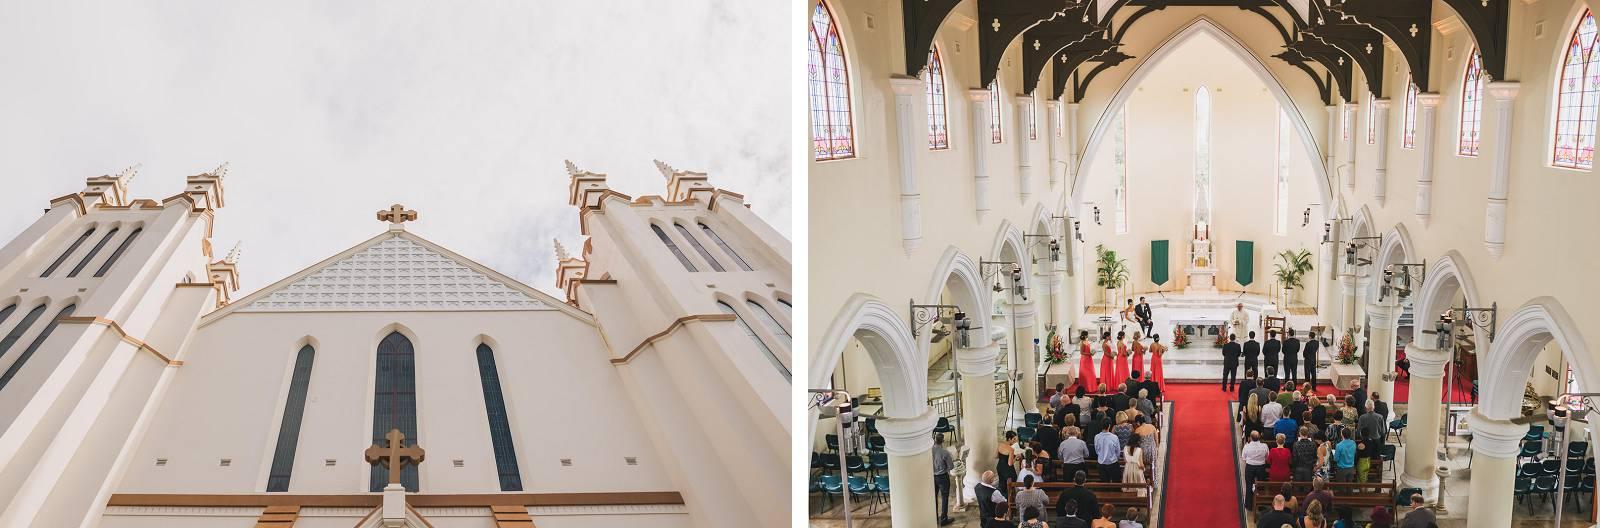 Innisfail Catholic Church wedding